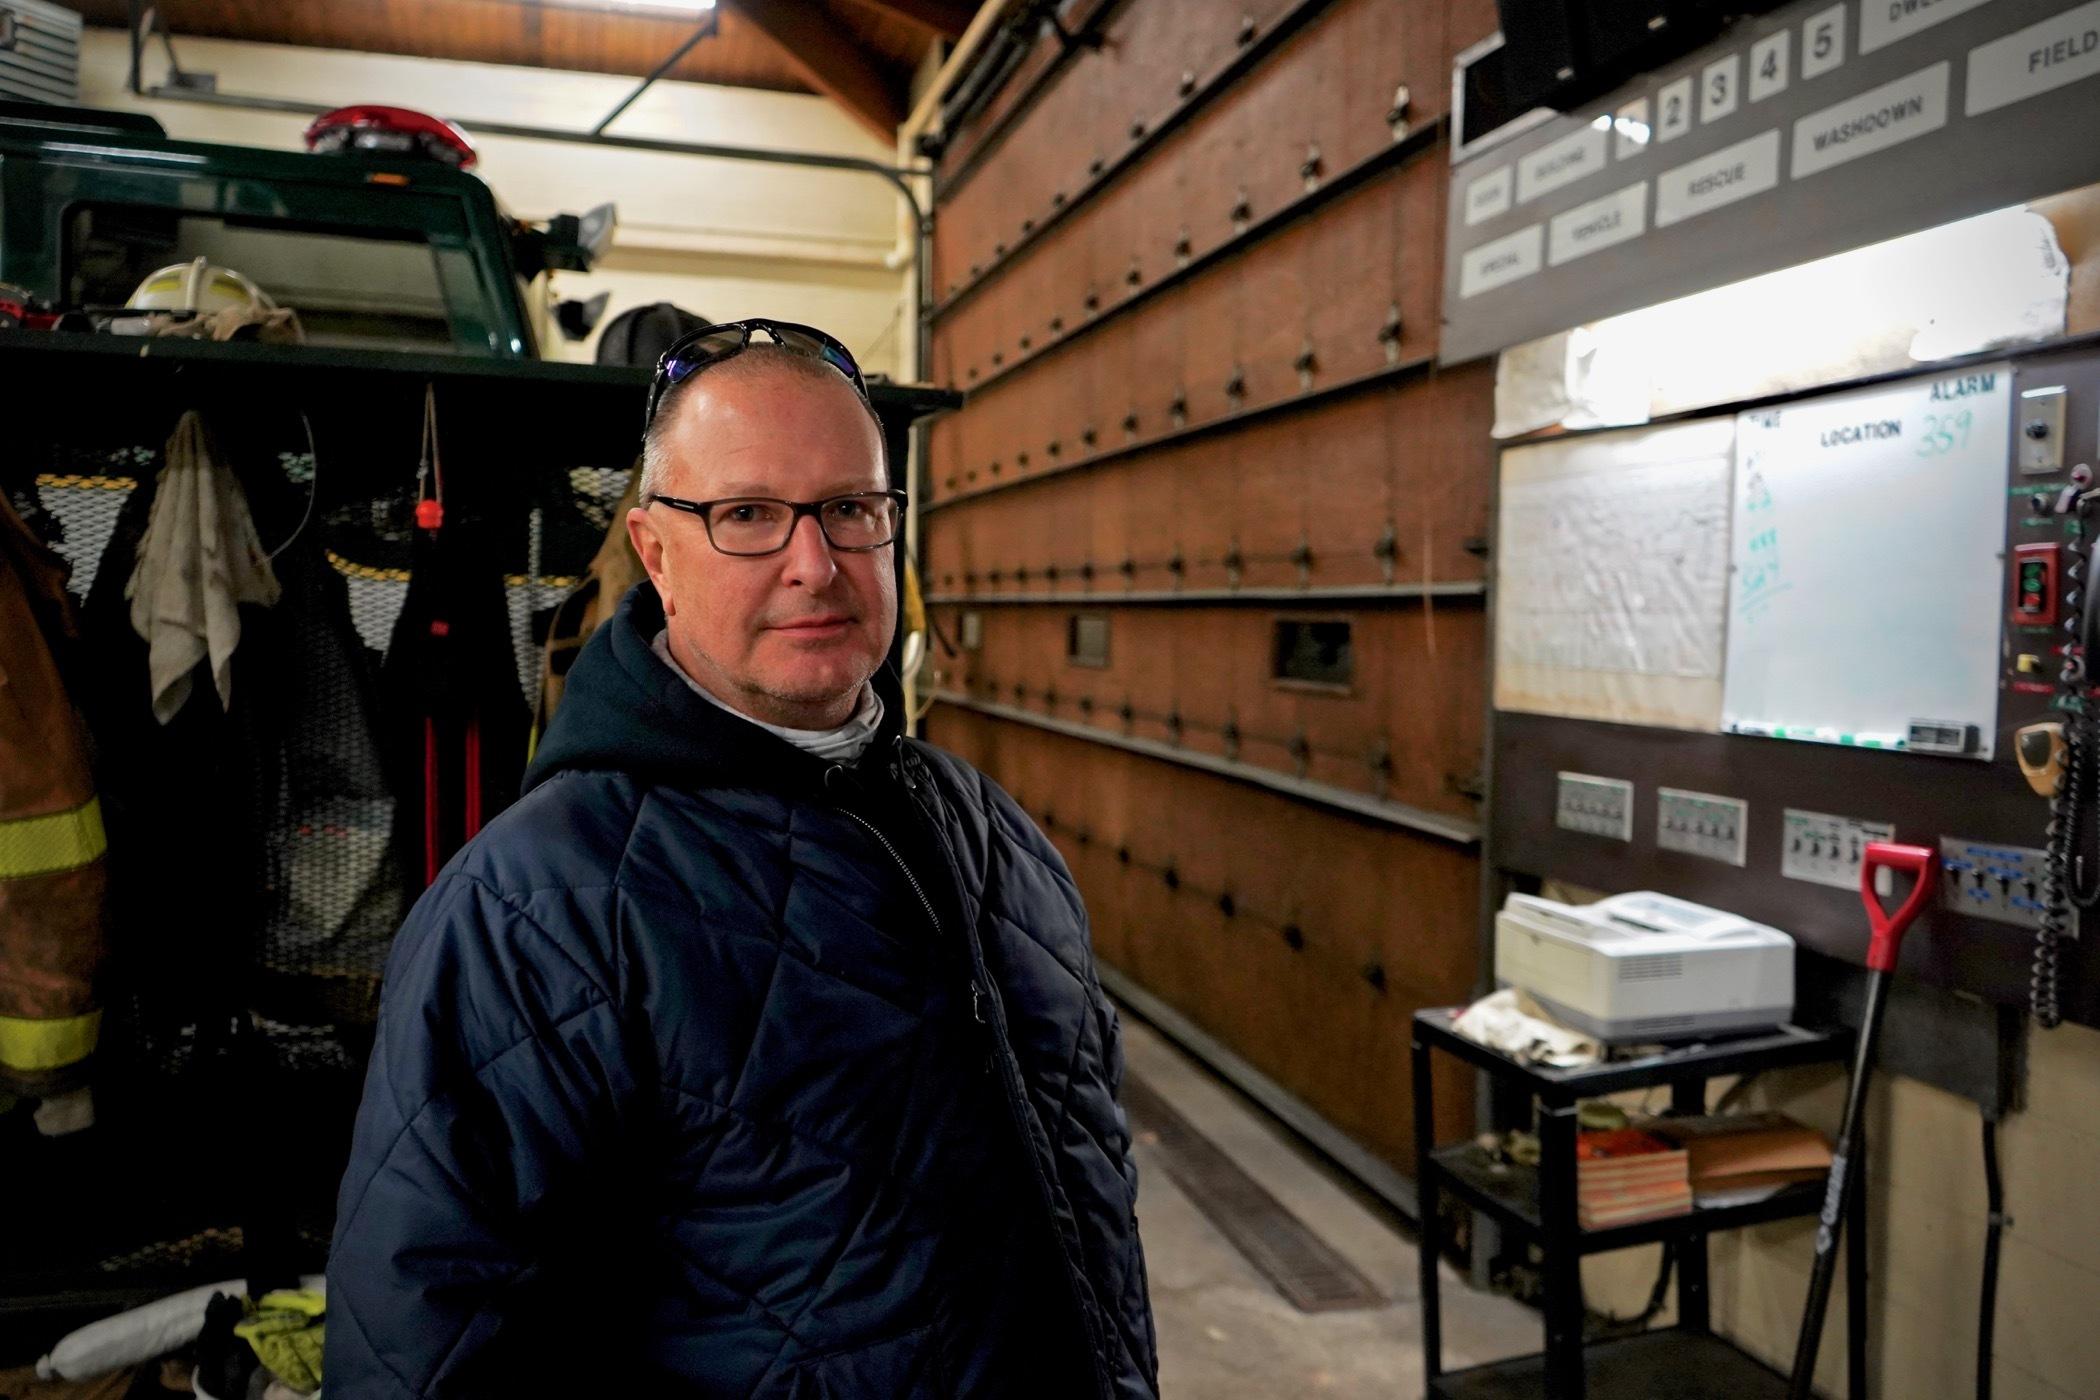 Thomas Prociuk stands inside a fire station